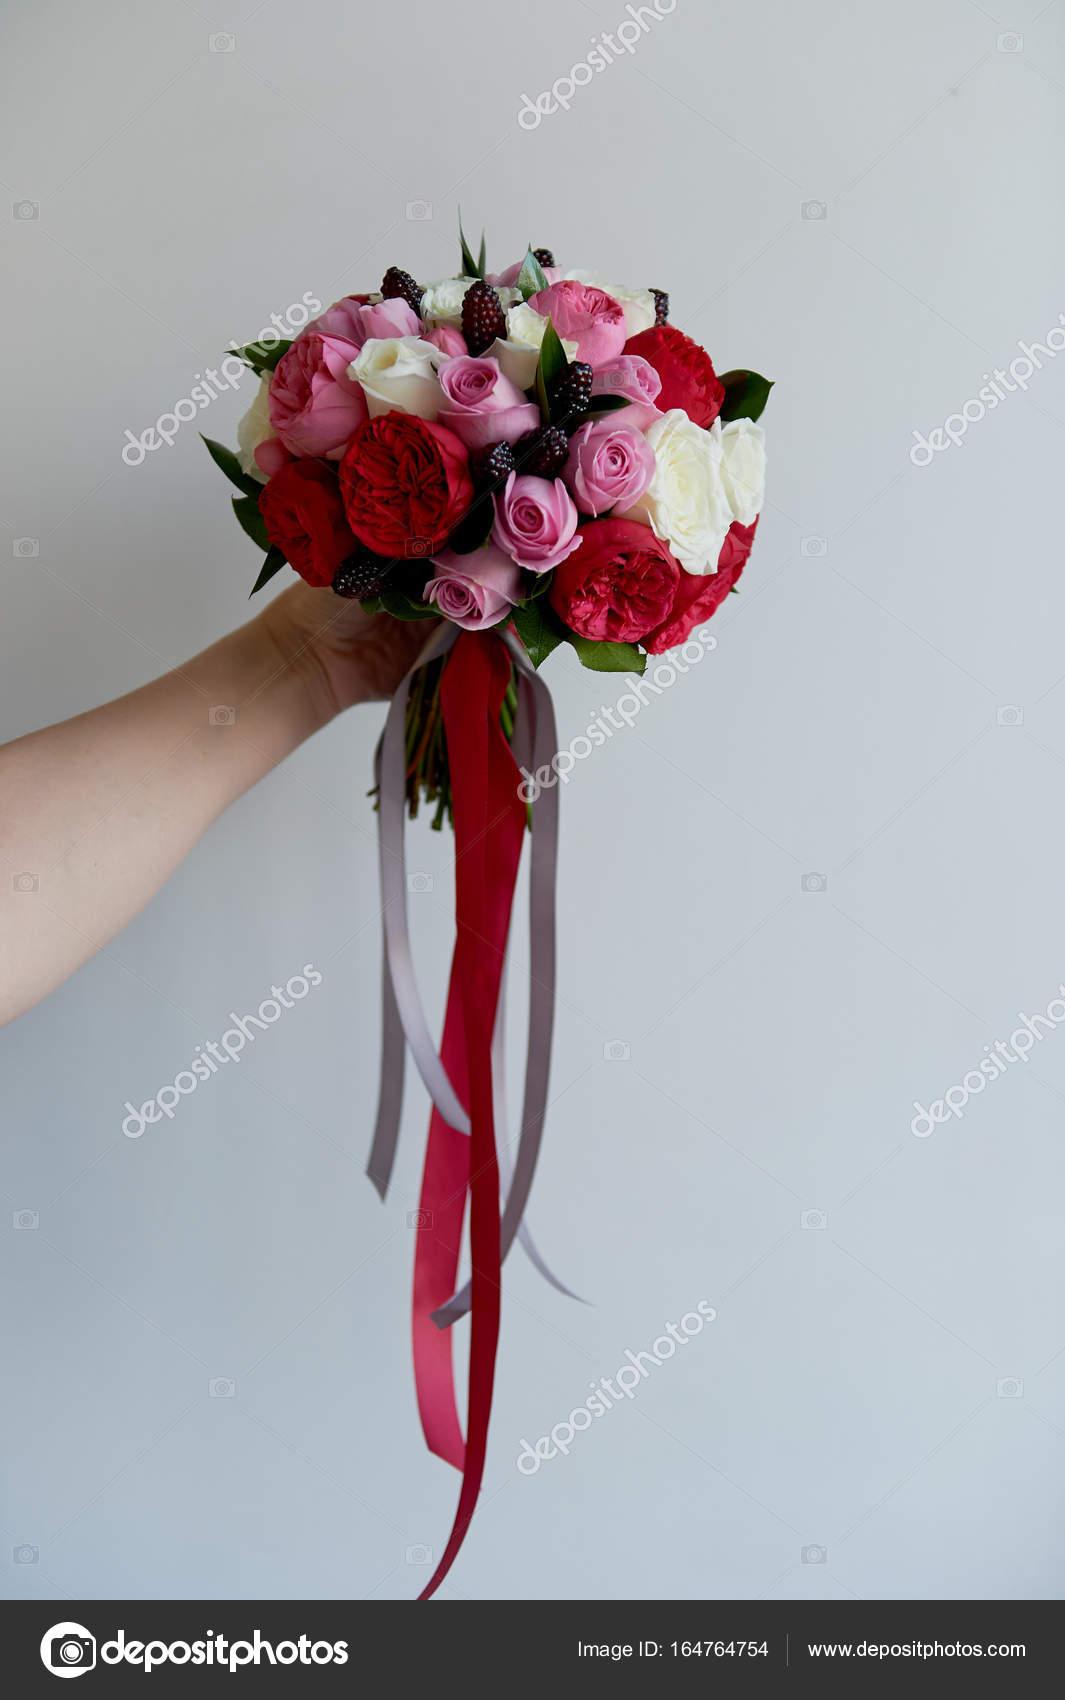 662e25b84103 Νυφική ανθοδέσμη γάμου σε κόκκινο